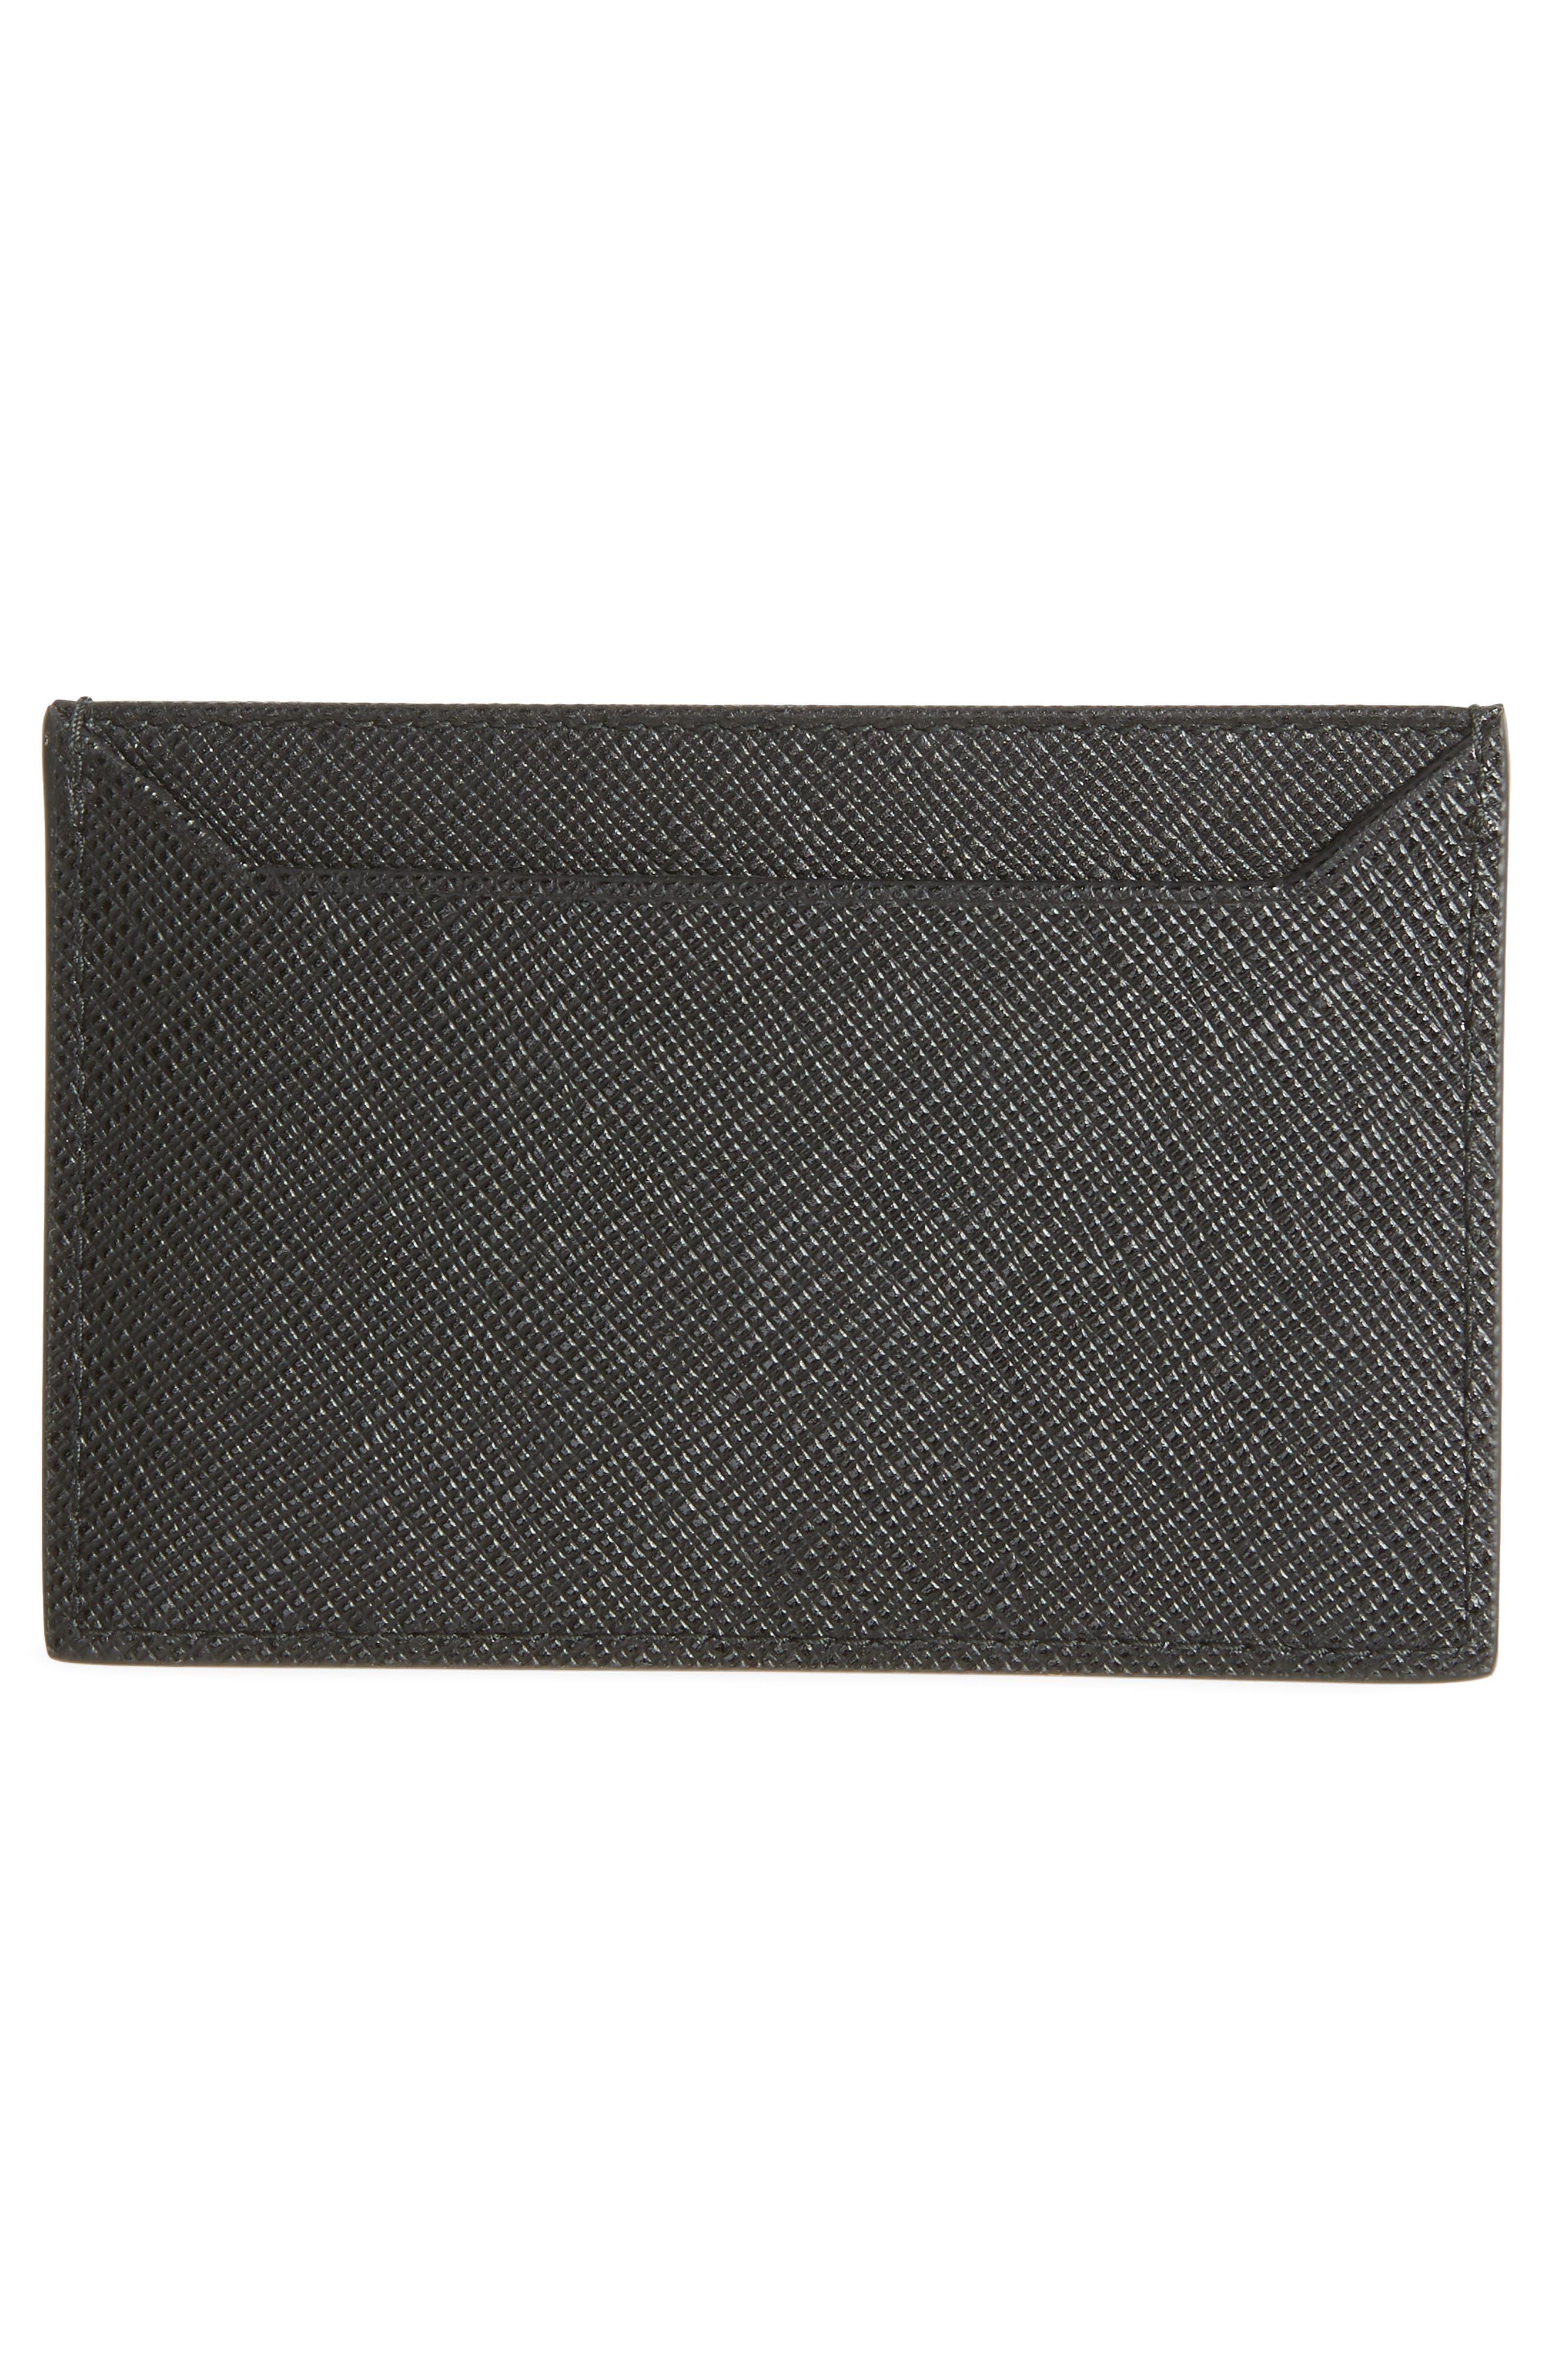 Saffiano Metal Oro Calfskin Leather Card Case,                             Alternate thumbnail 2, color,                             NERO